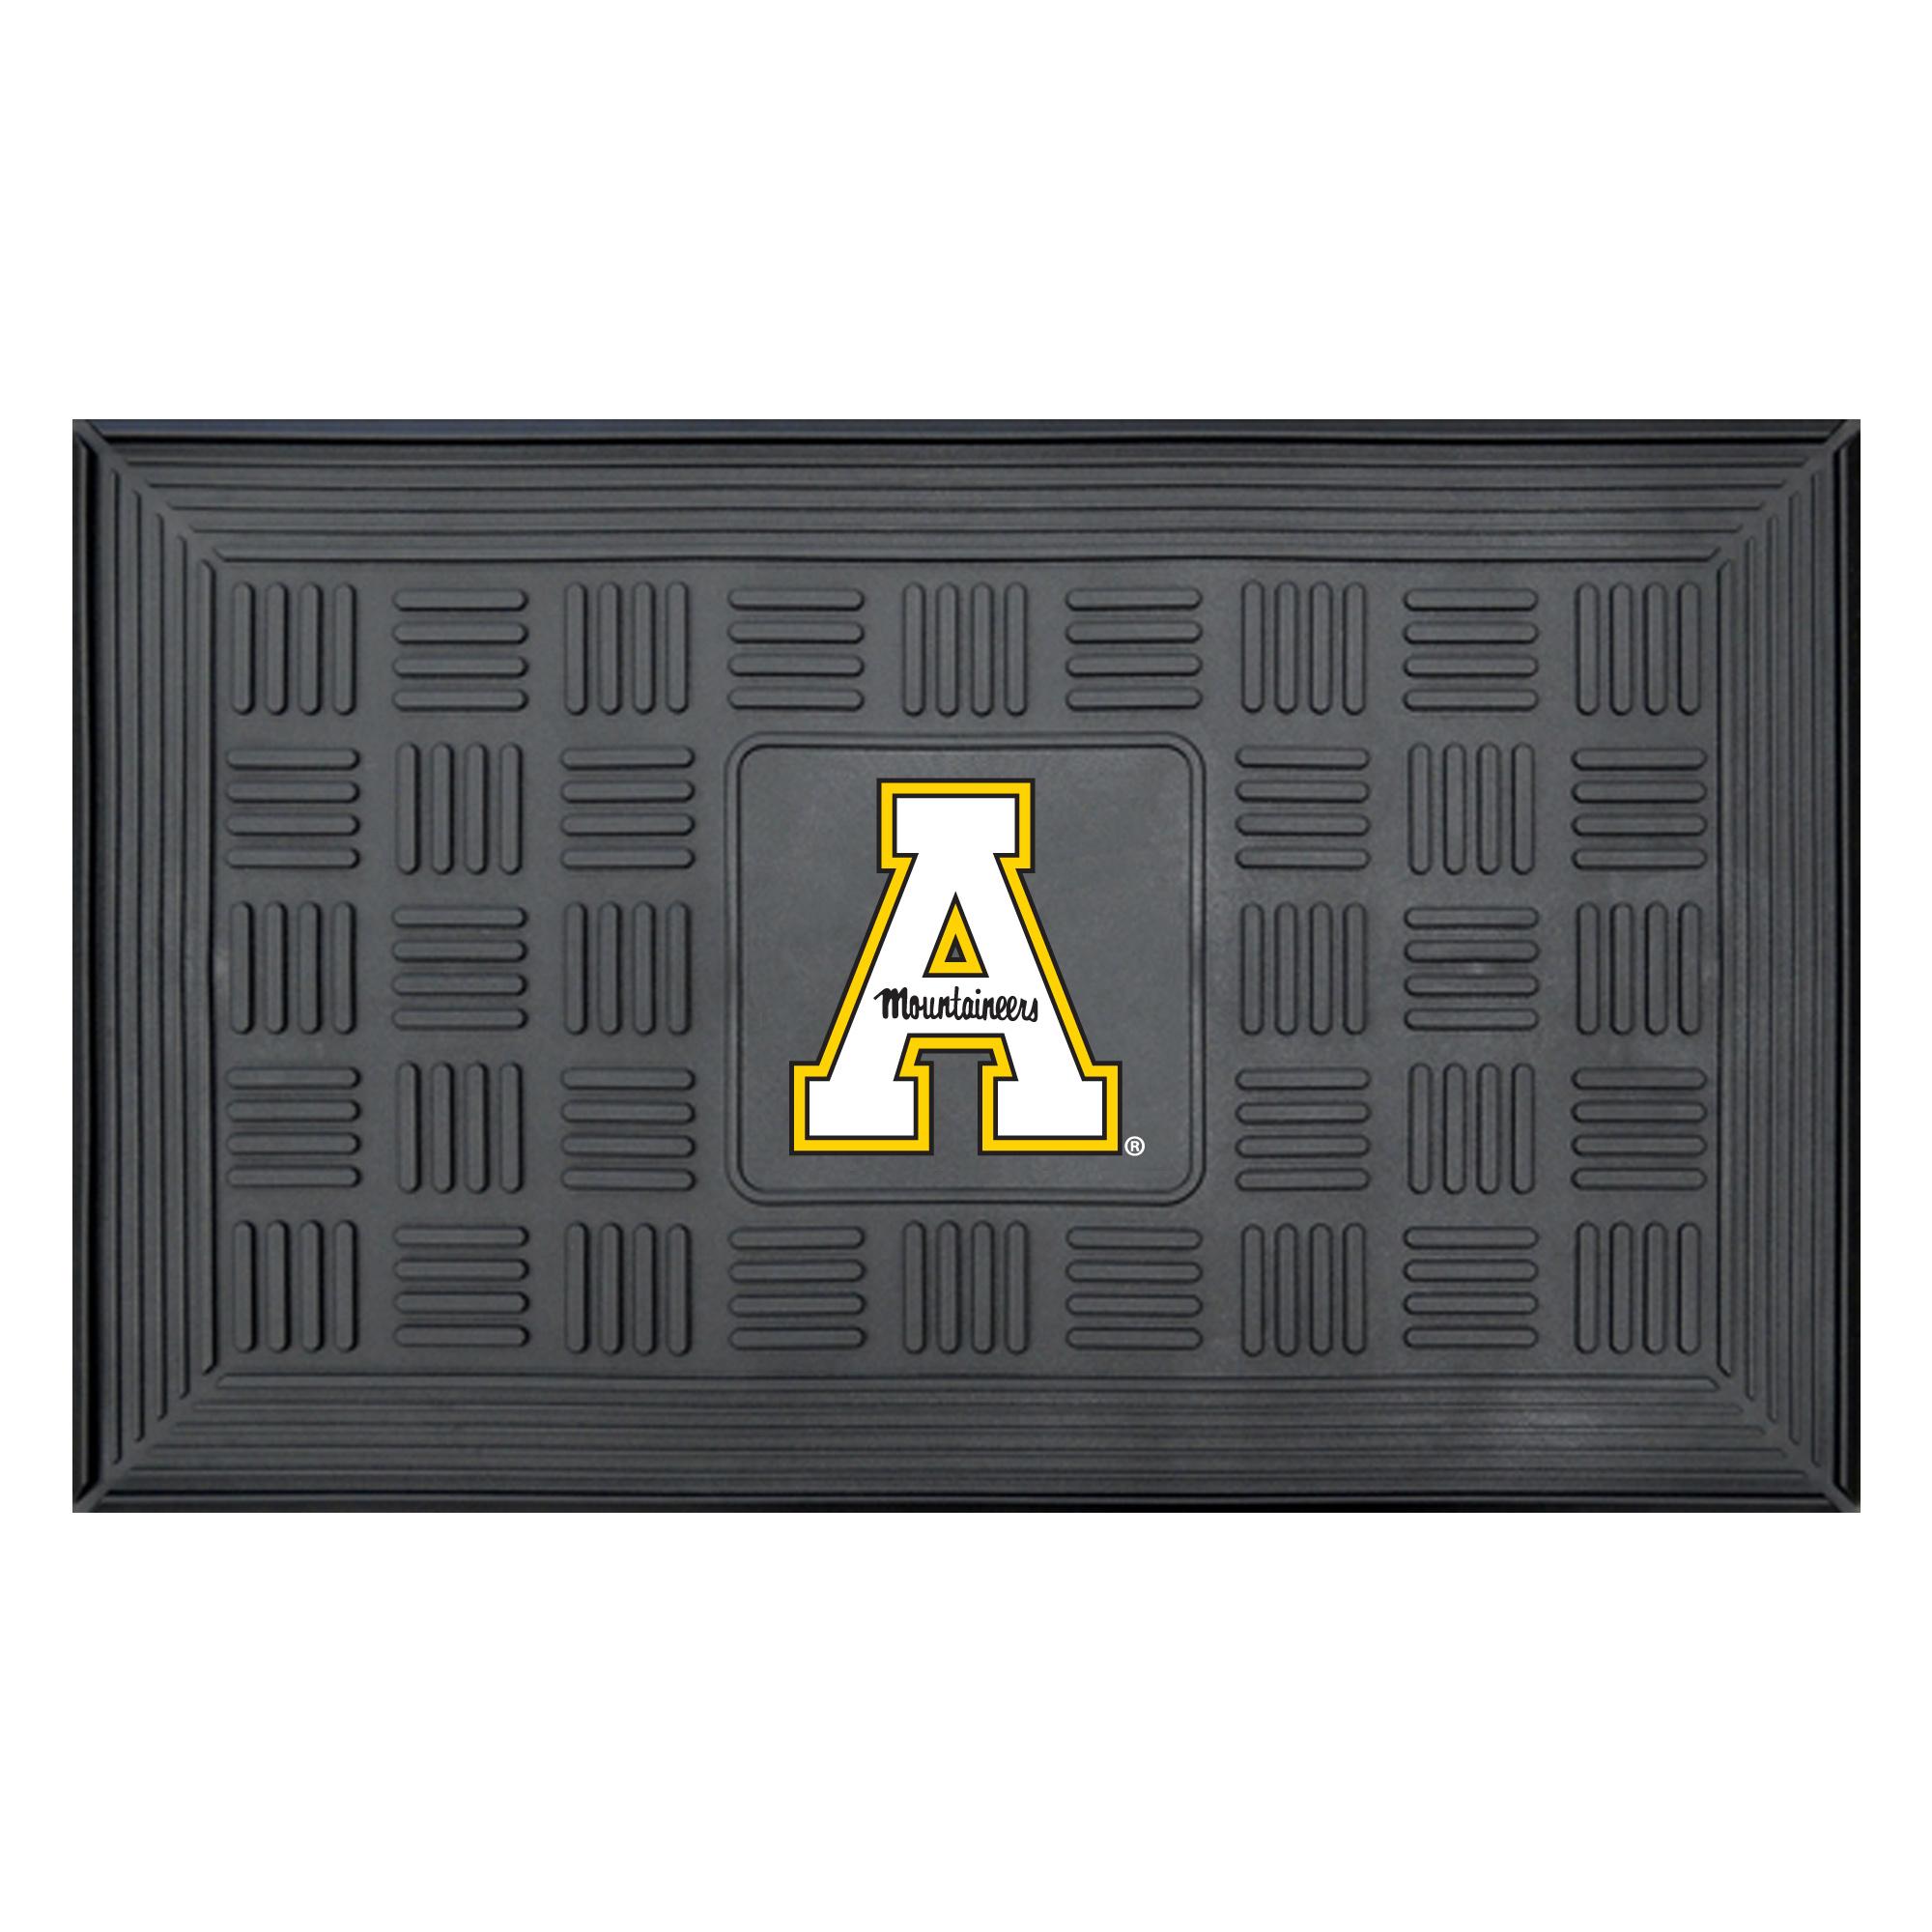 12438 Fanmats College NCAA Appalachian State 19.5 Inch x 31.25 Inch durable vinyl 3-D molded team logo Medallion Door Mat